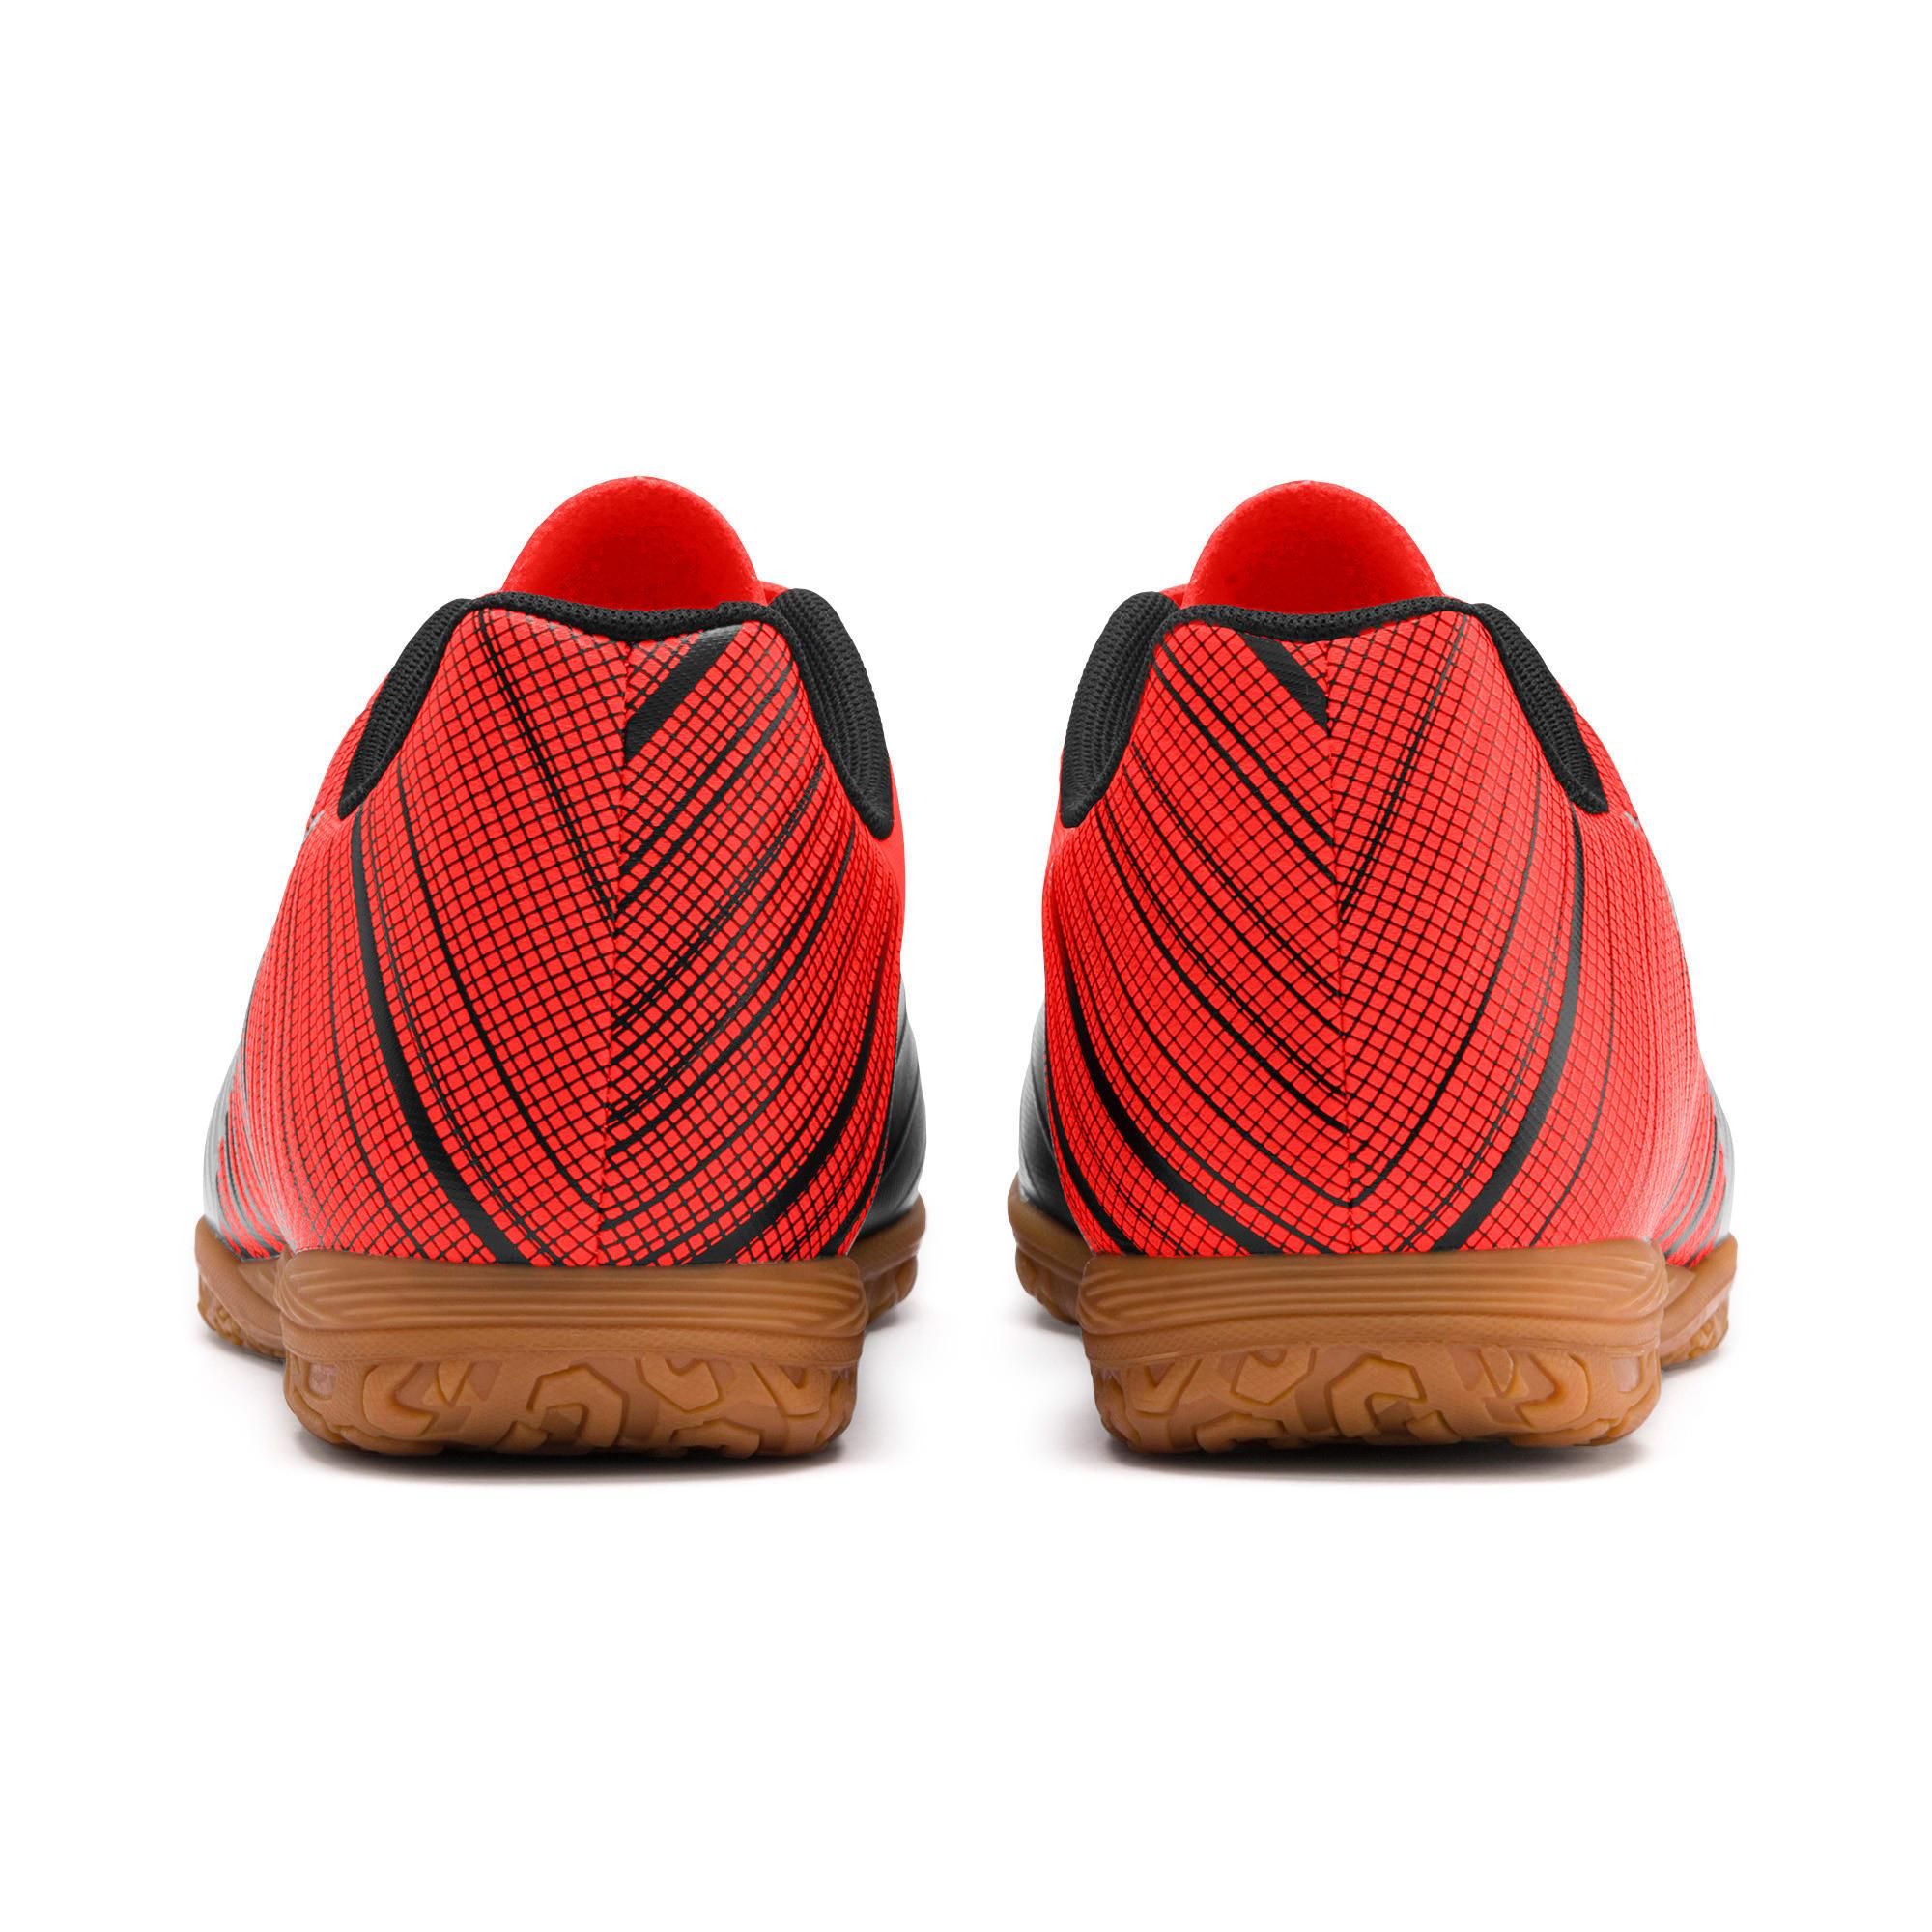 Thumbnail 4 of PUMA ONE 5.4 IT Men's Soccer Shoes, Black-Red-Silver-Gum, medium